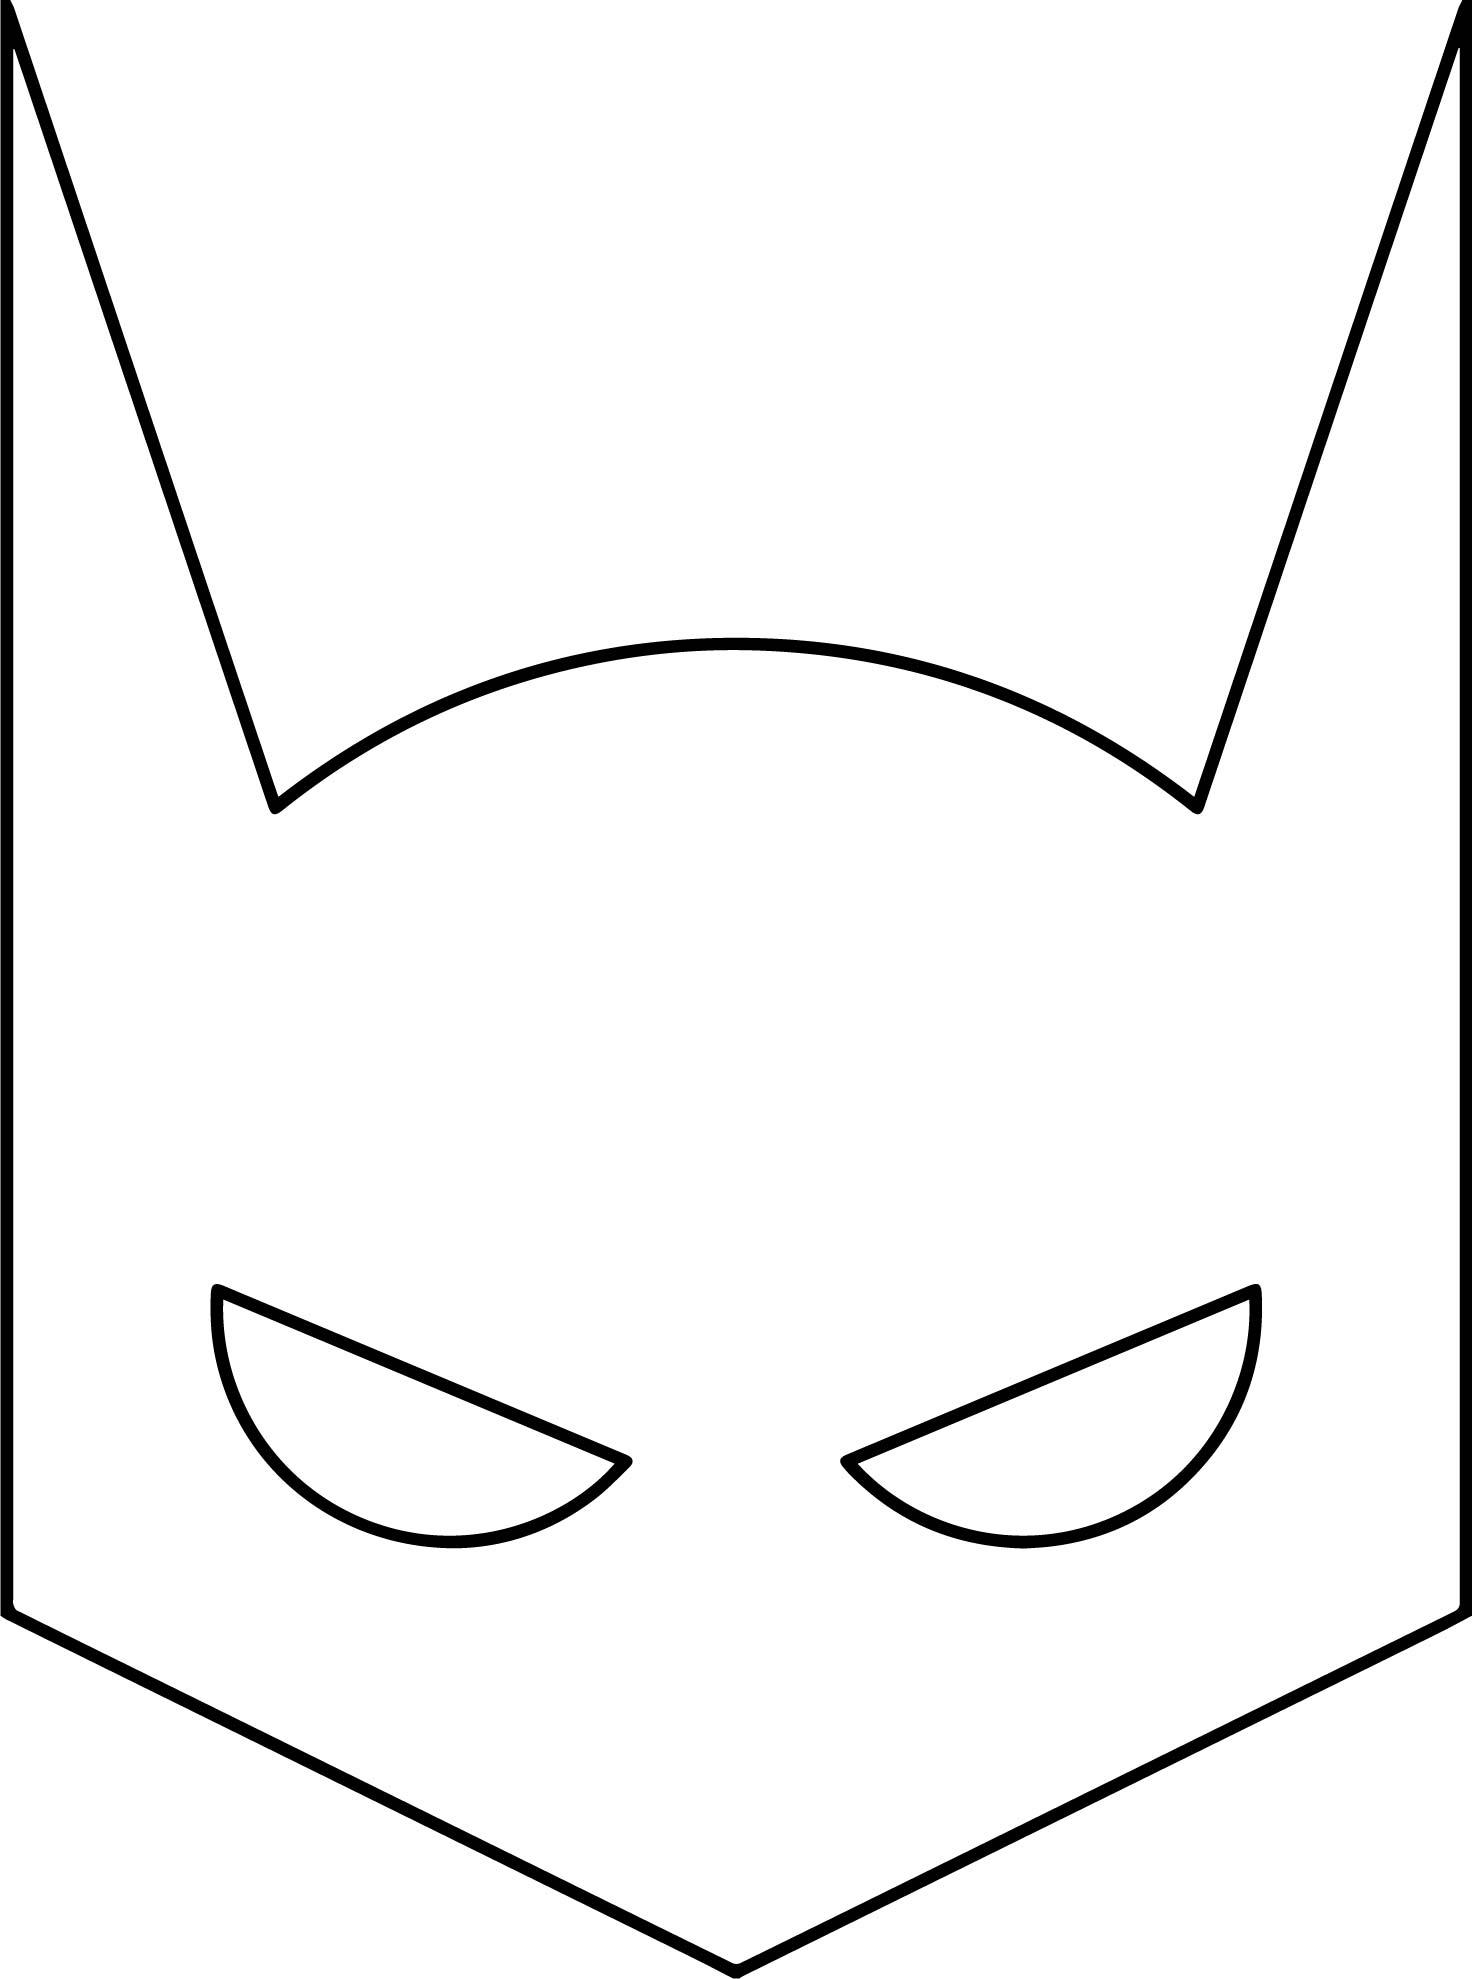 Mask Spiderman Coloring Page Pj Masks Spider Man Hulk Coloring